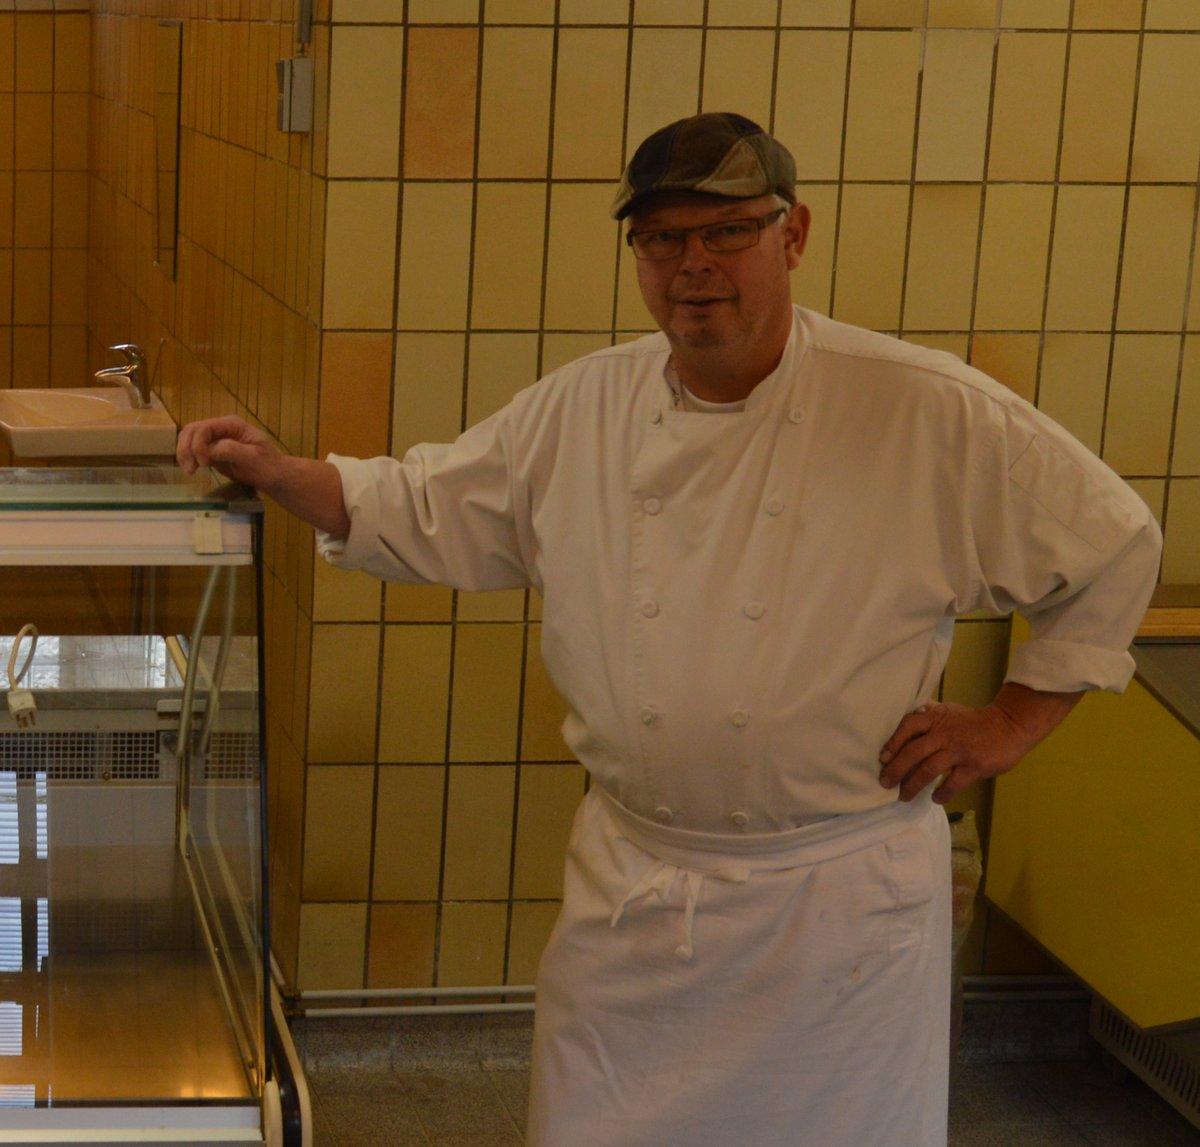 Lars Peter Christiansen fra Delikatessen viser oste-lokalet frem. Her vil man hver fredag kunne købe ost.